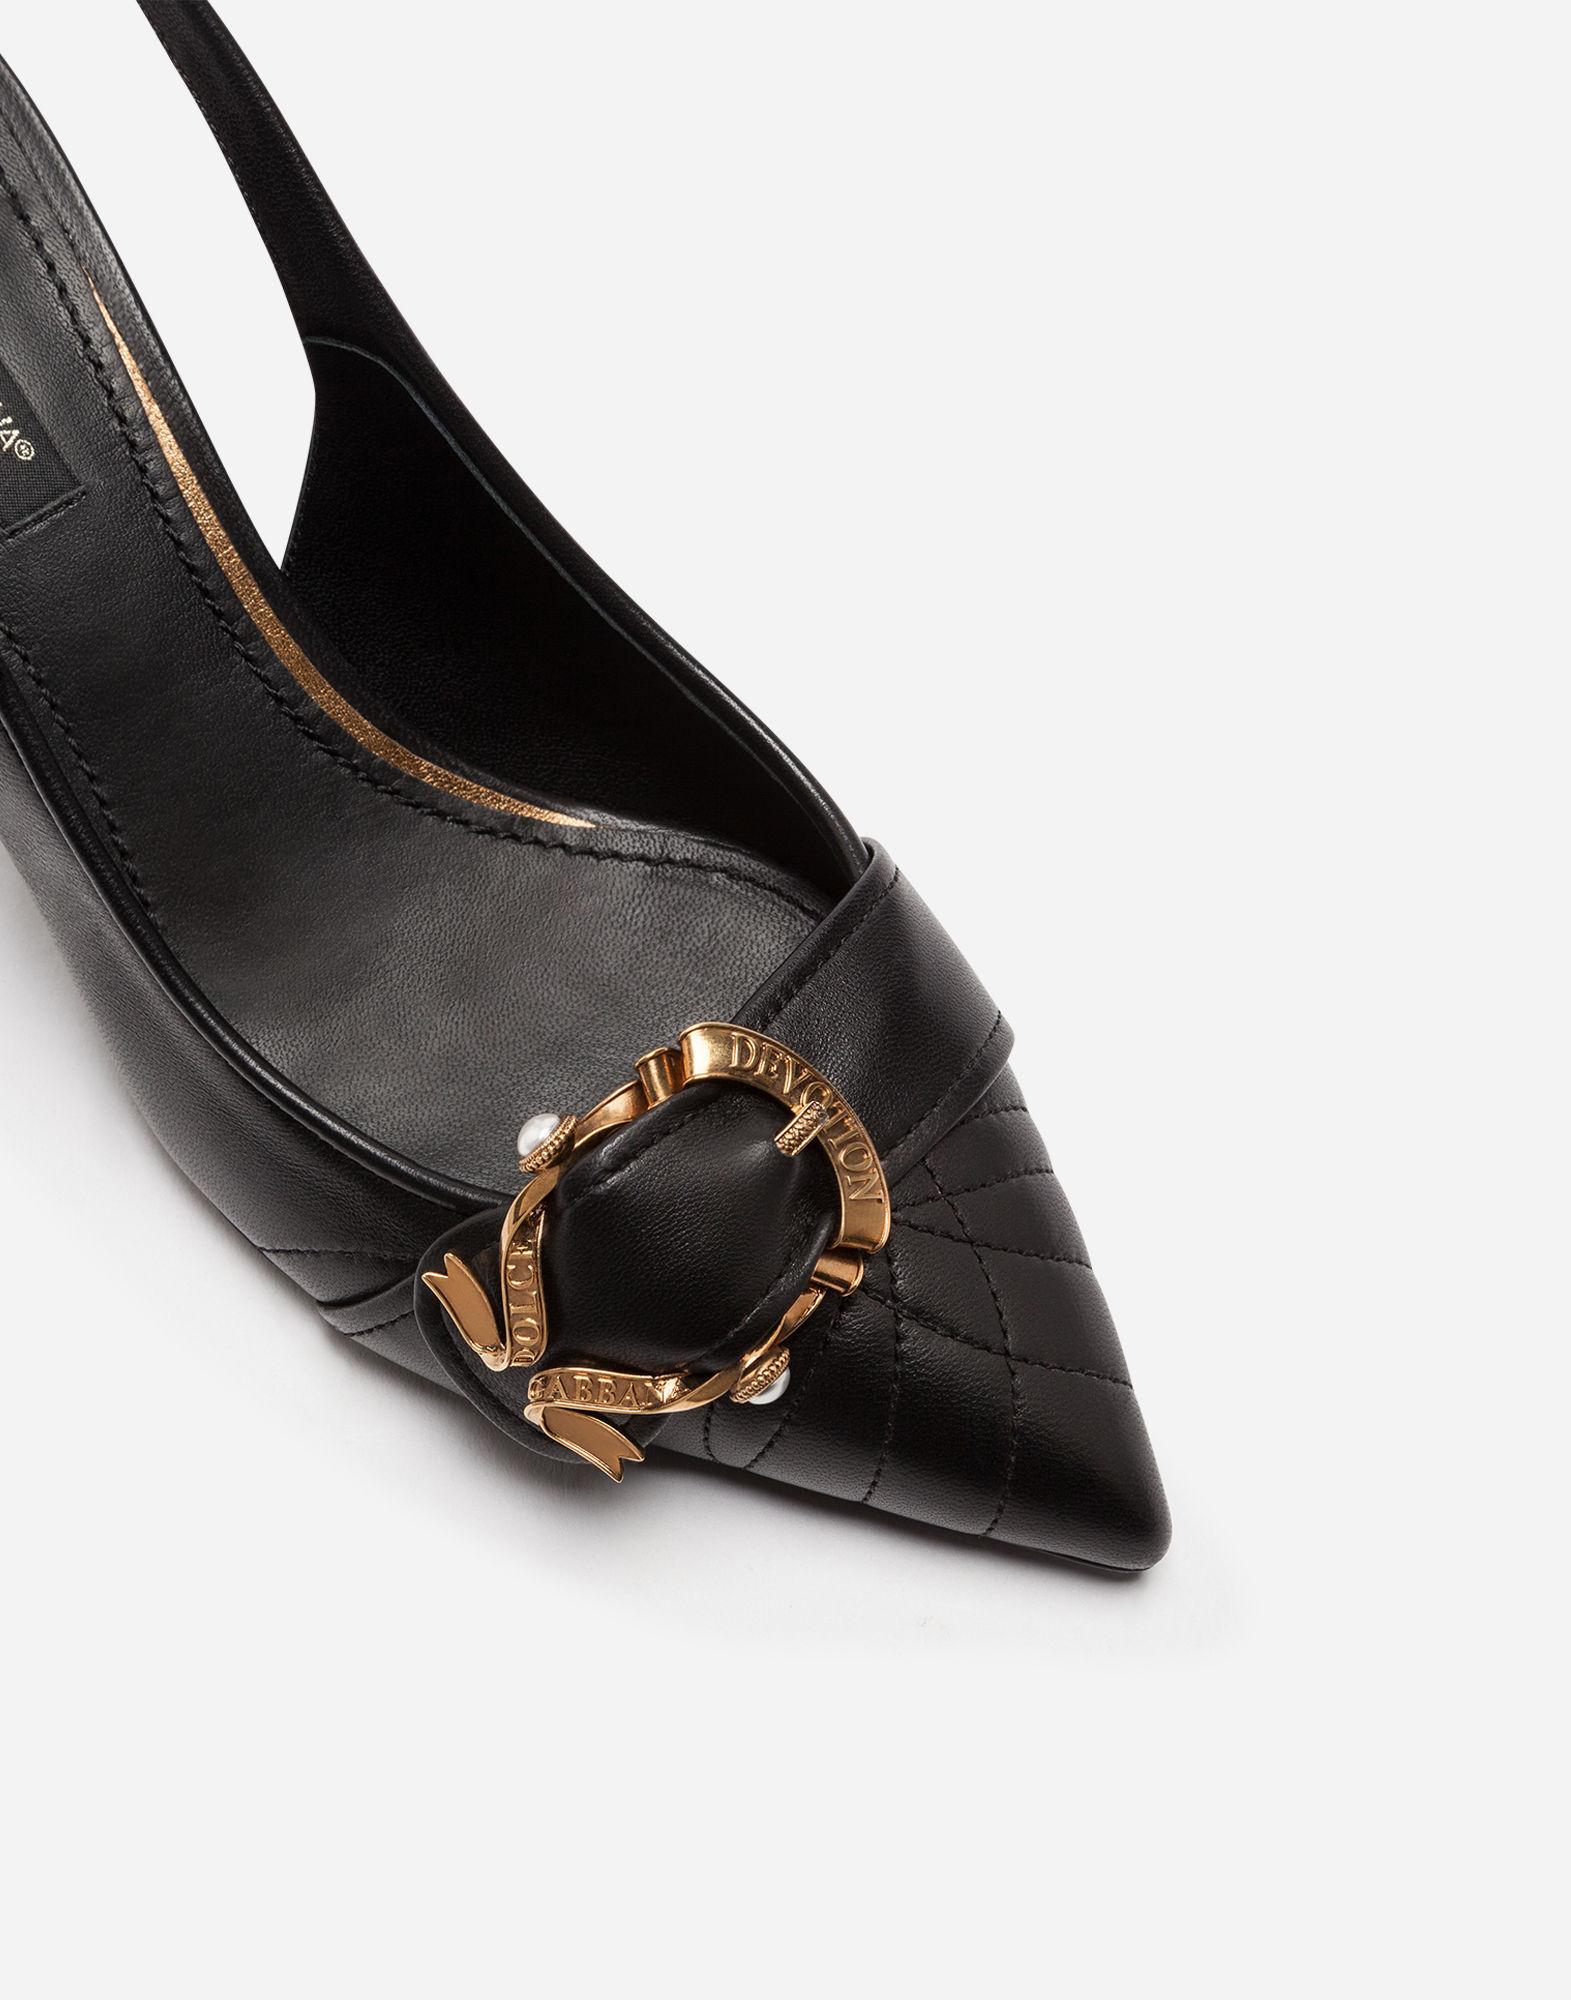 scarpe-devotion-dolce-e-gabbana-8